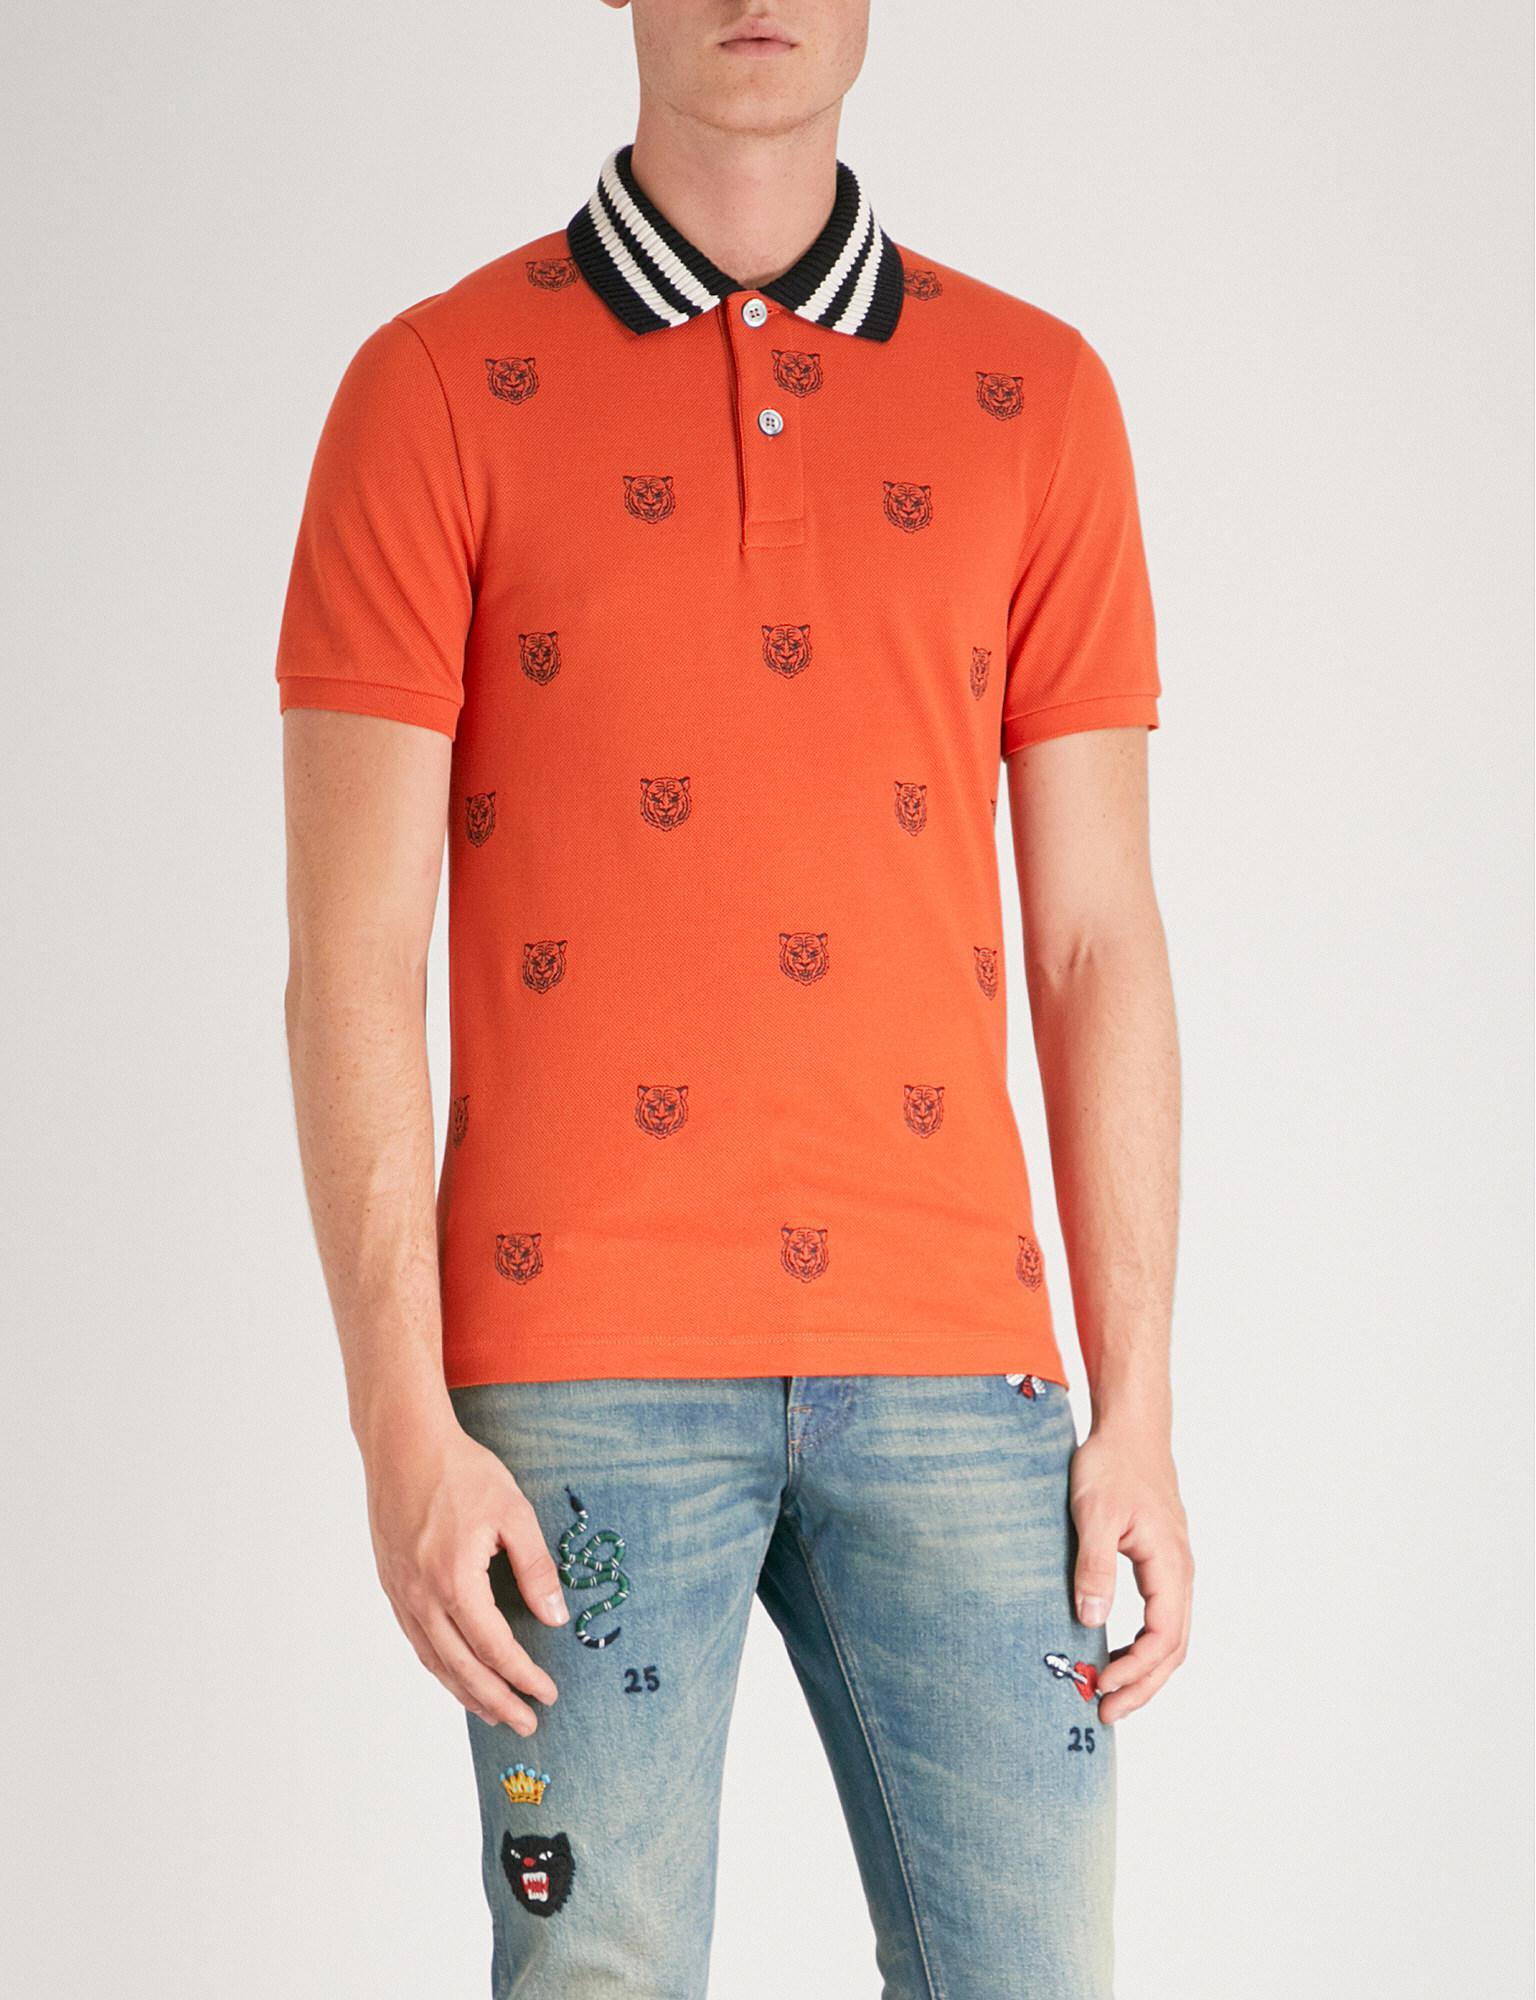 d6ada1cc1 Gucci Tiger-embroidered Slim-fit Cotton-pique Polo Shirt in Orange ...